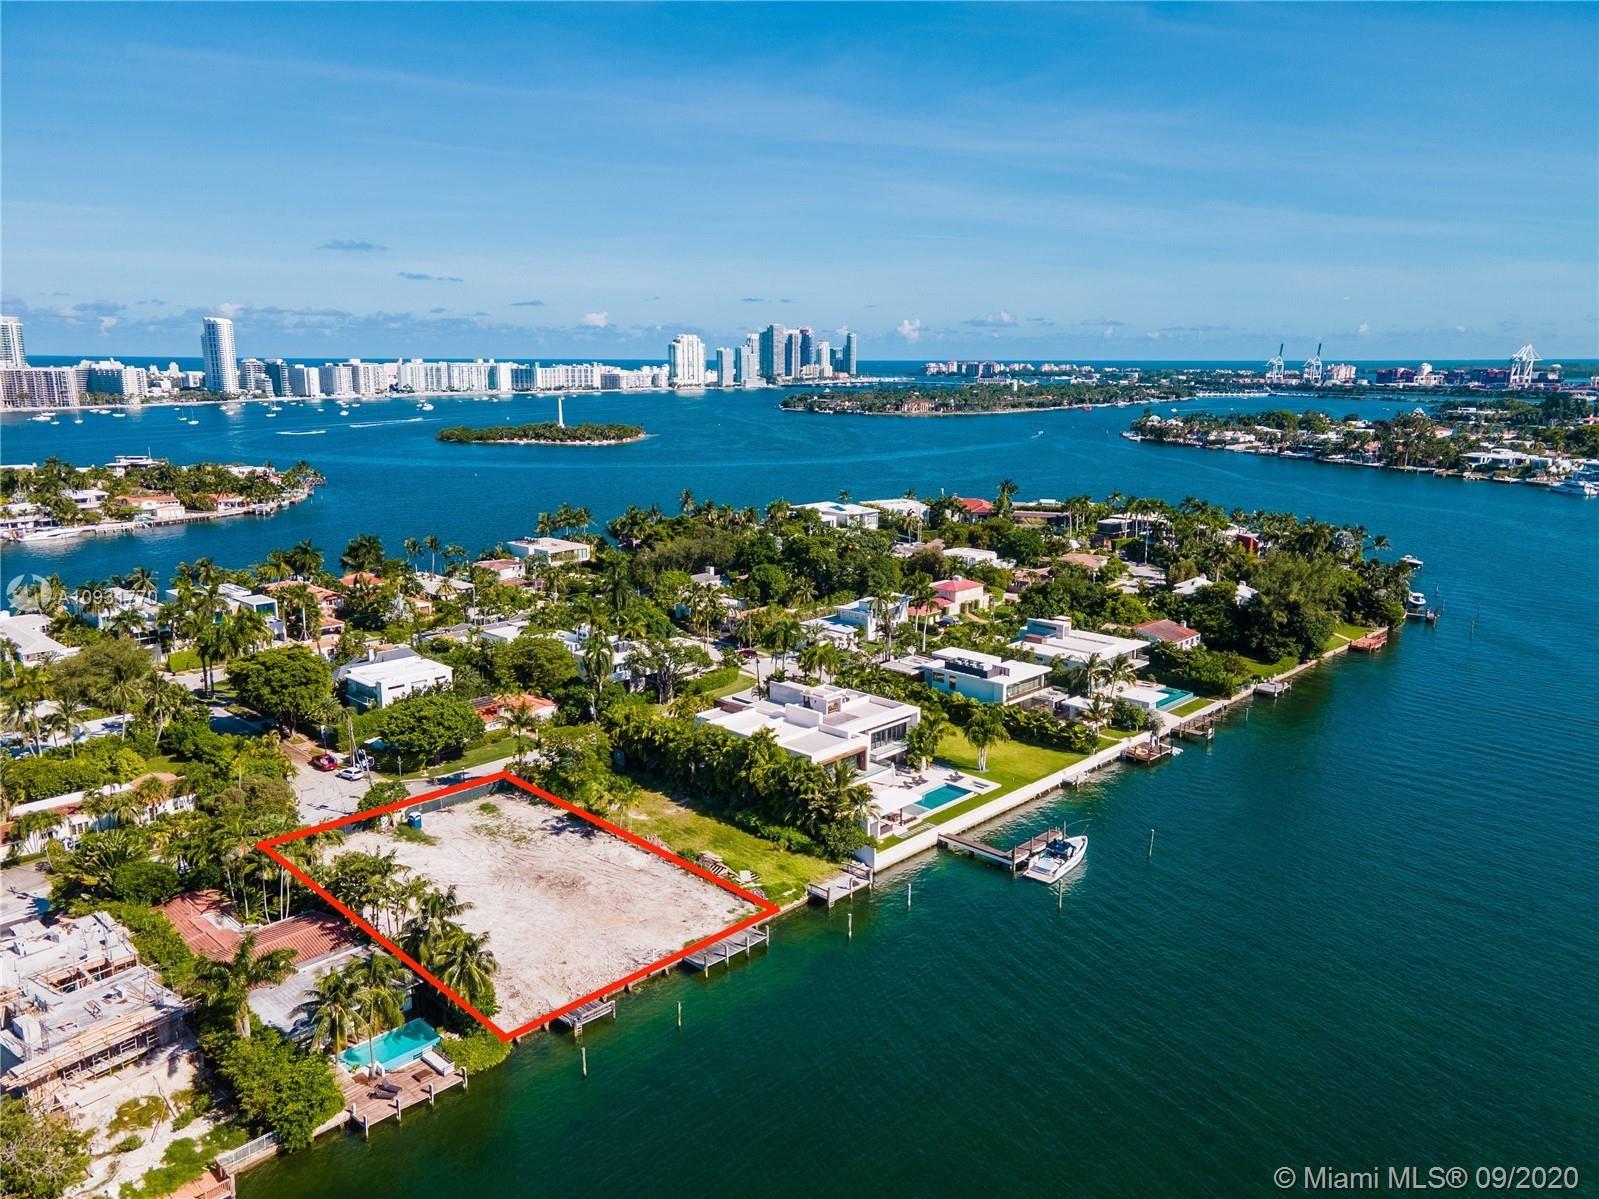 Photo of 228 302 W DI LIDO DR, Miami Beach, FL 33139 (MLS # A10931770)